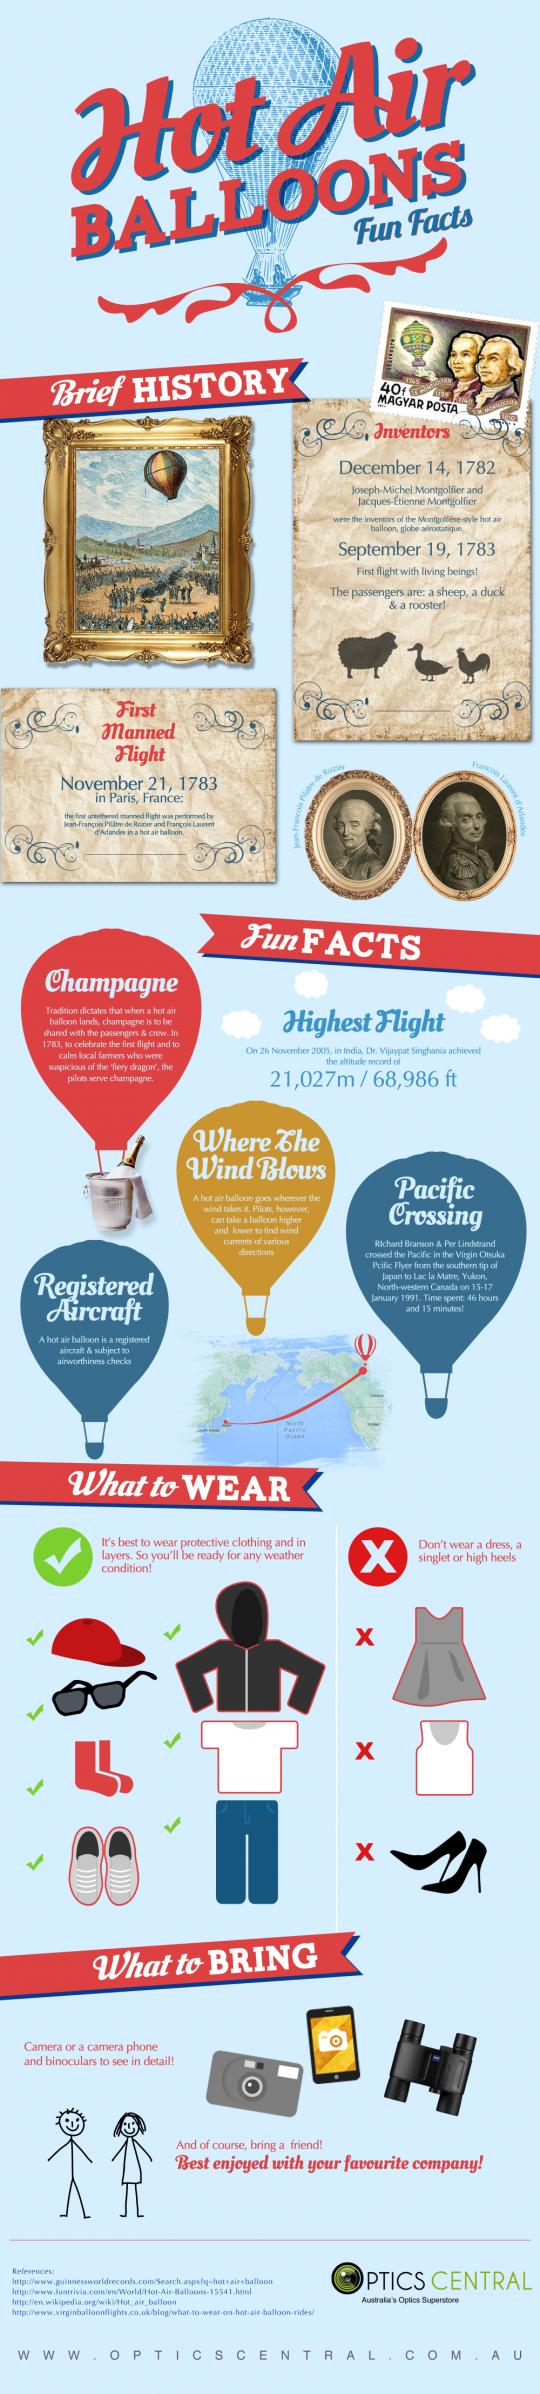 Hot Air Balloons Fun Facts